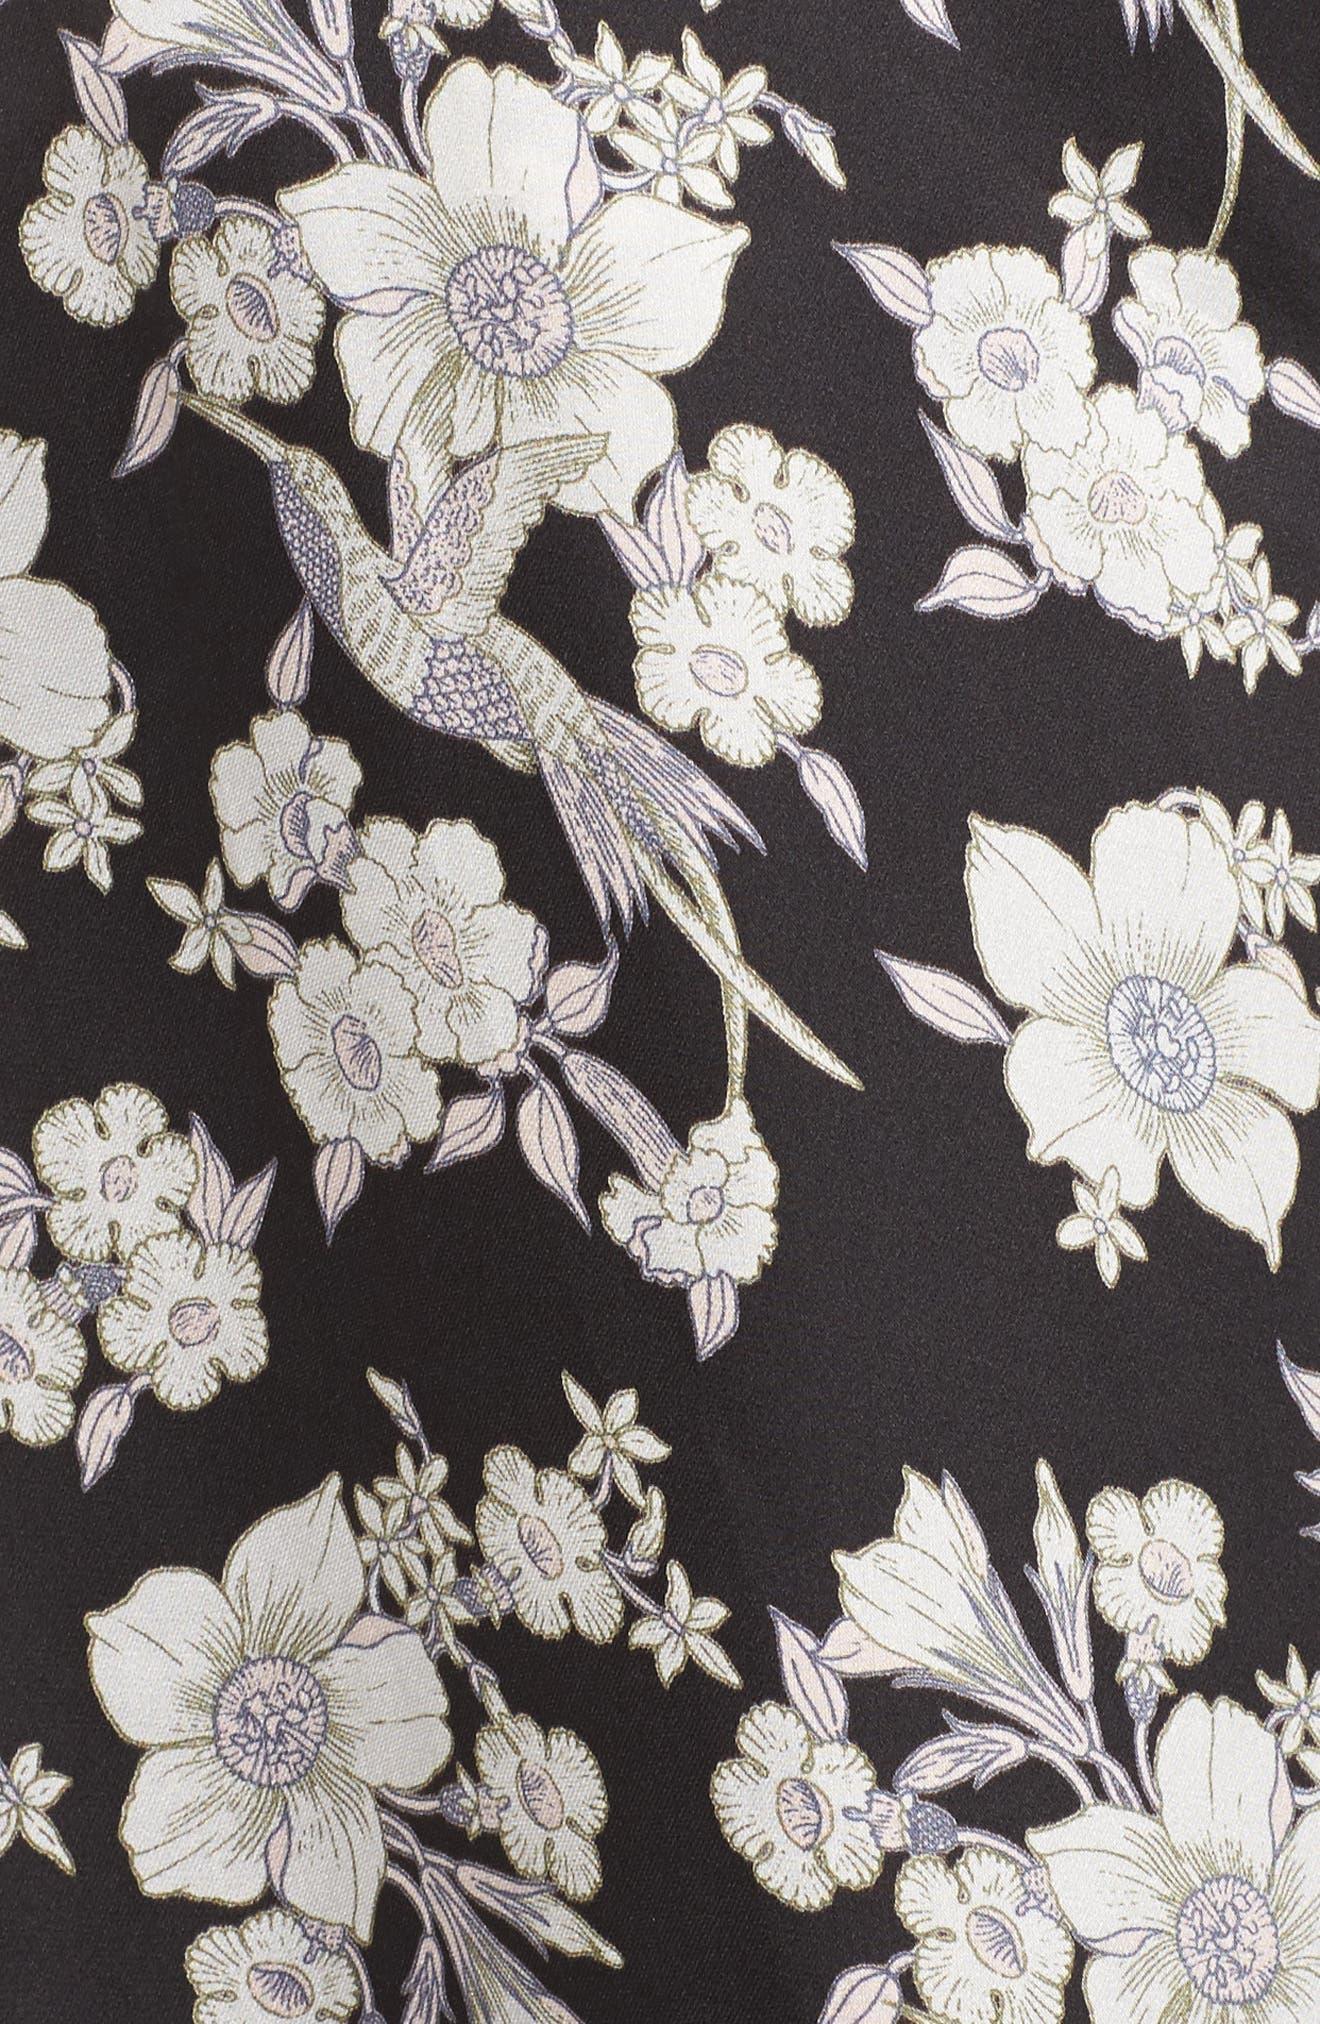 Birdee Wide Leg Pants,                             Alternate thumbnail 5, color,                             Black Floral